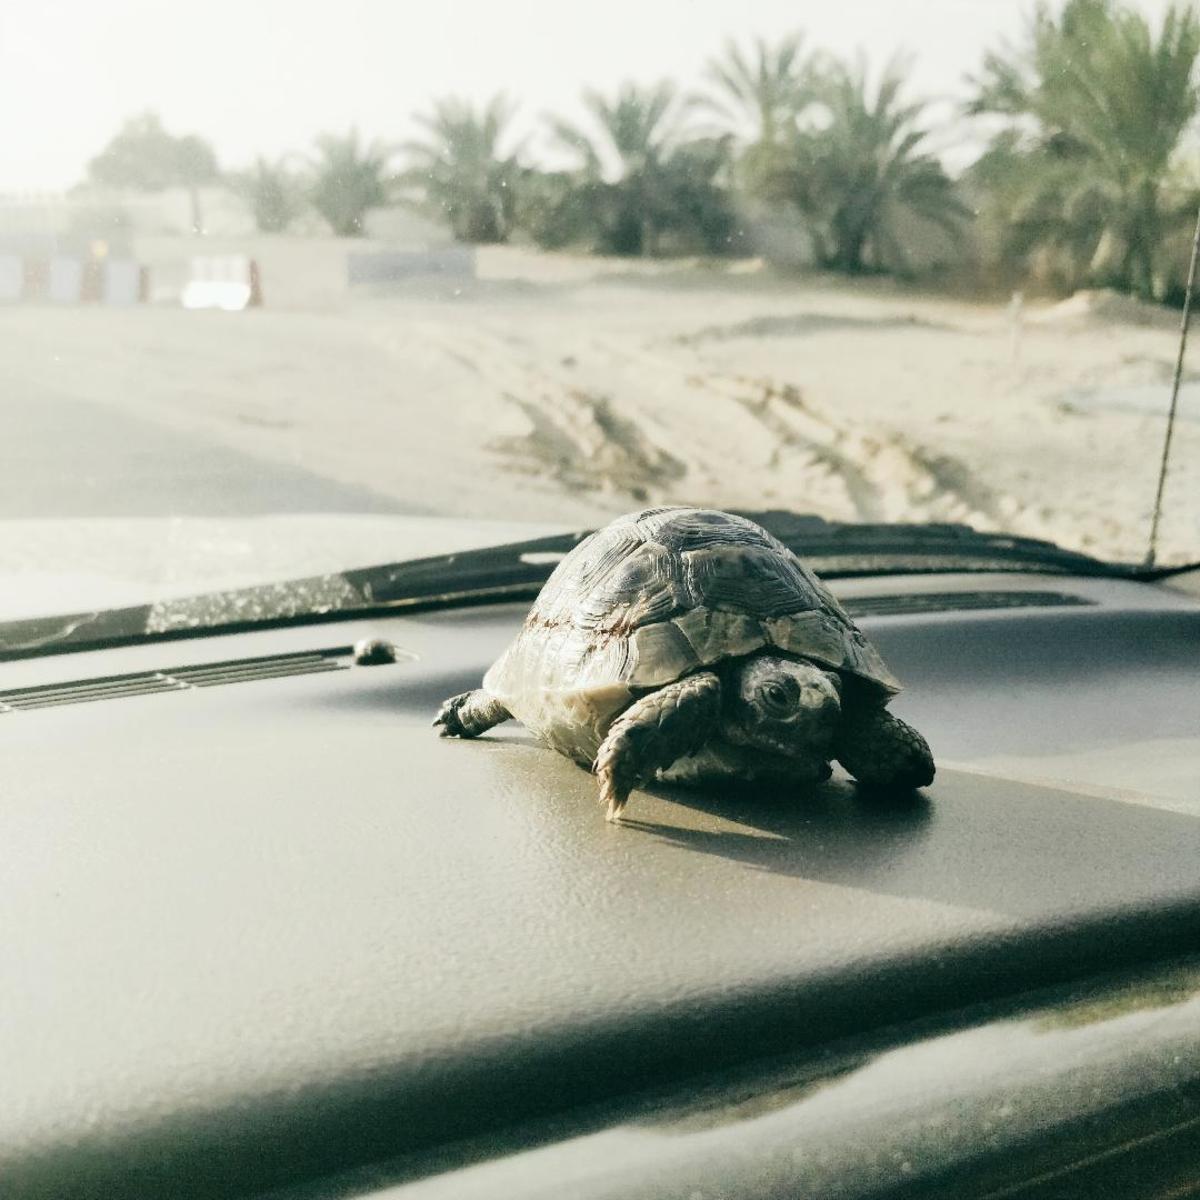 My tortoise Lenny, sitting on the dashboard of a car